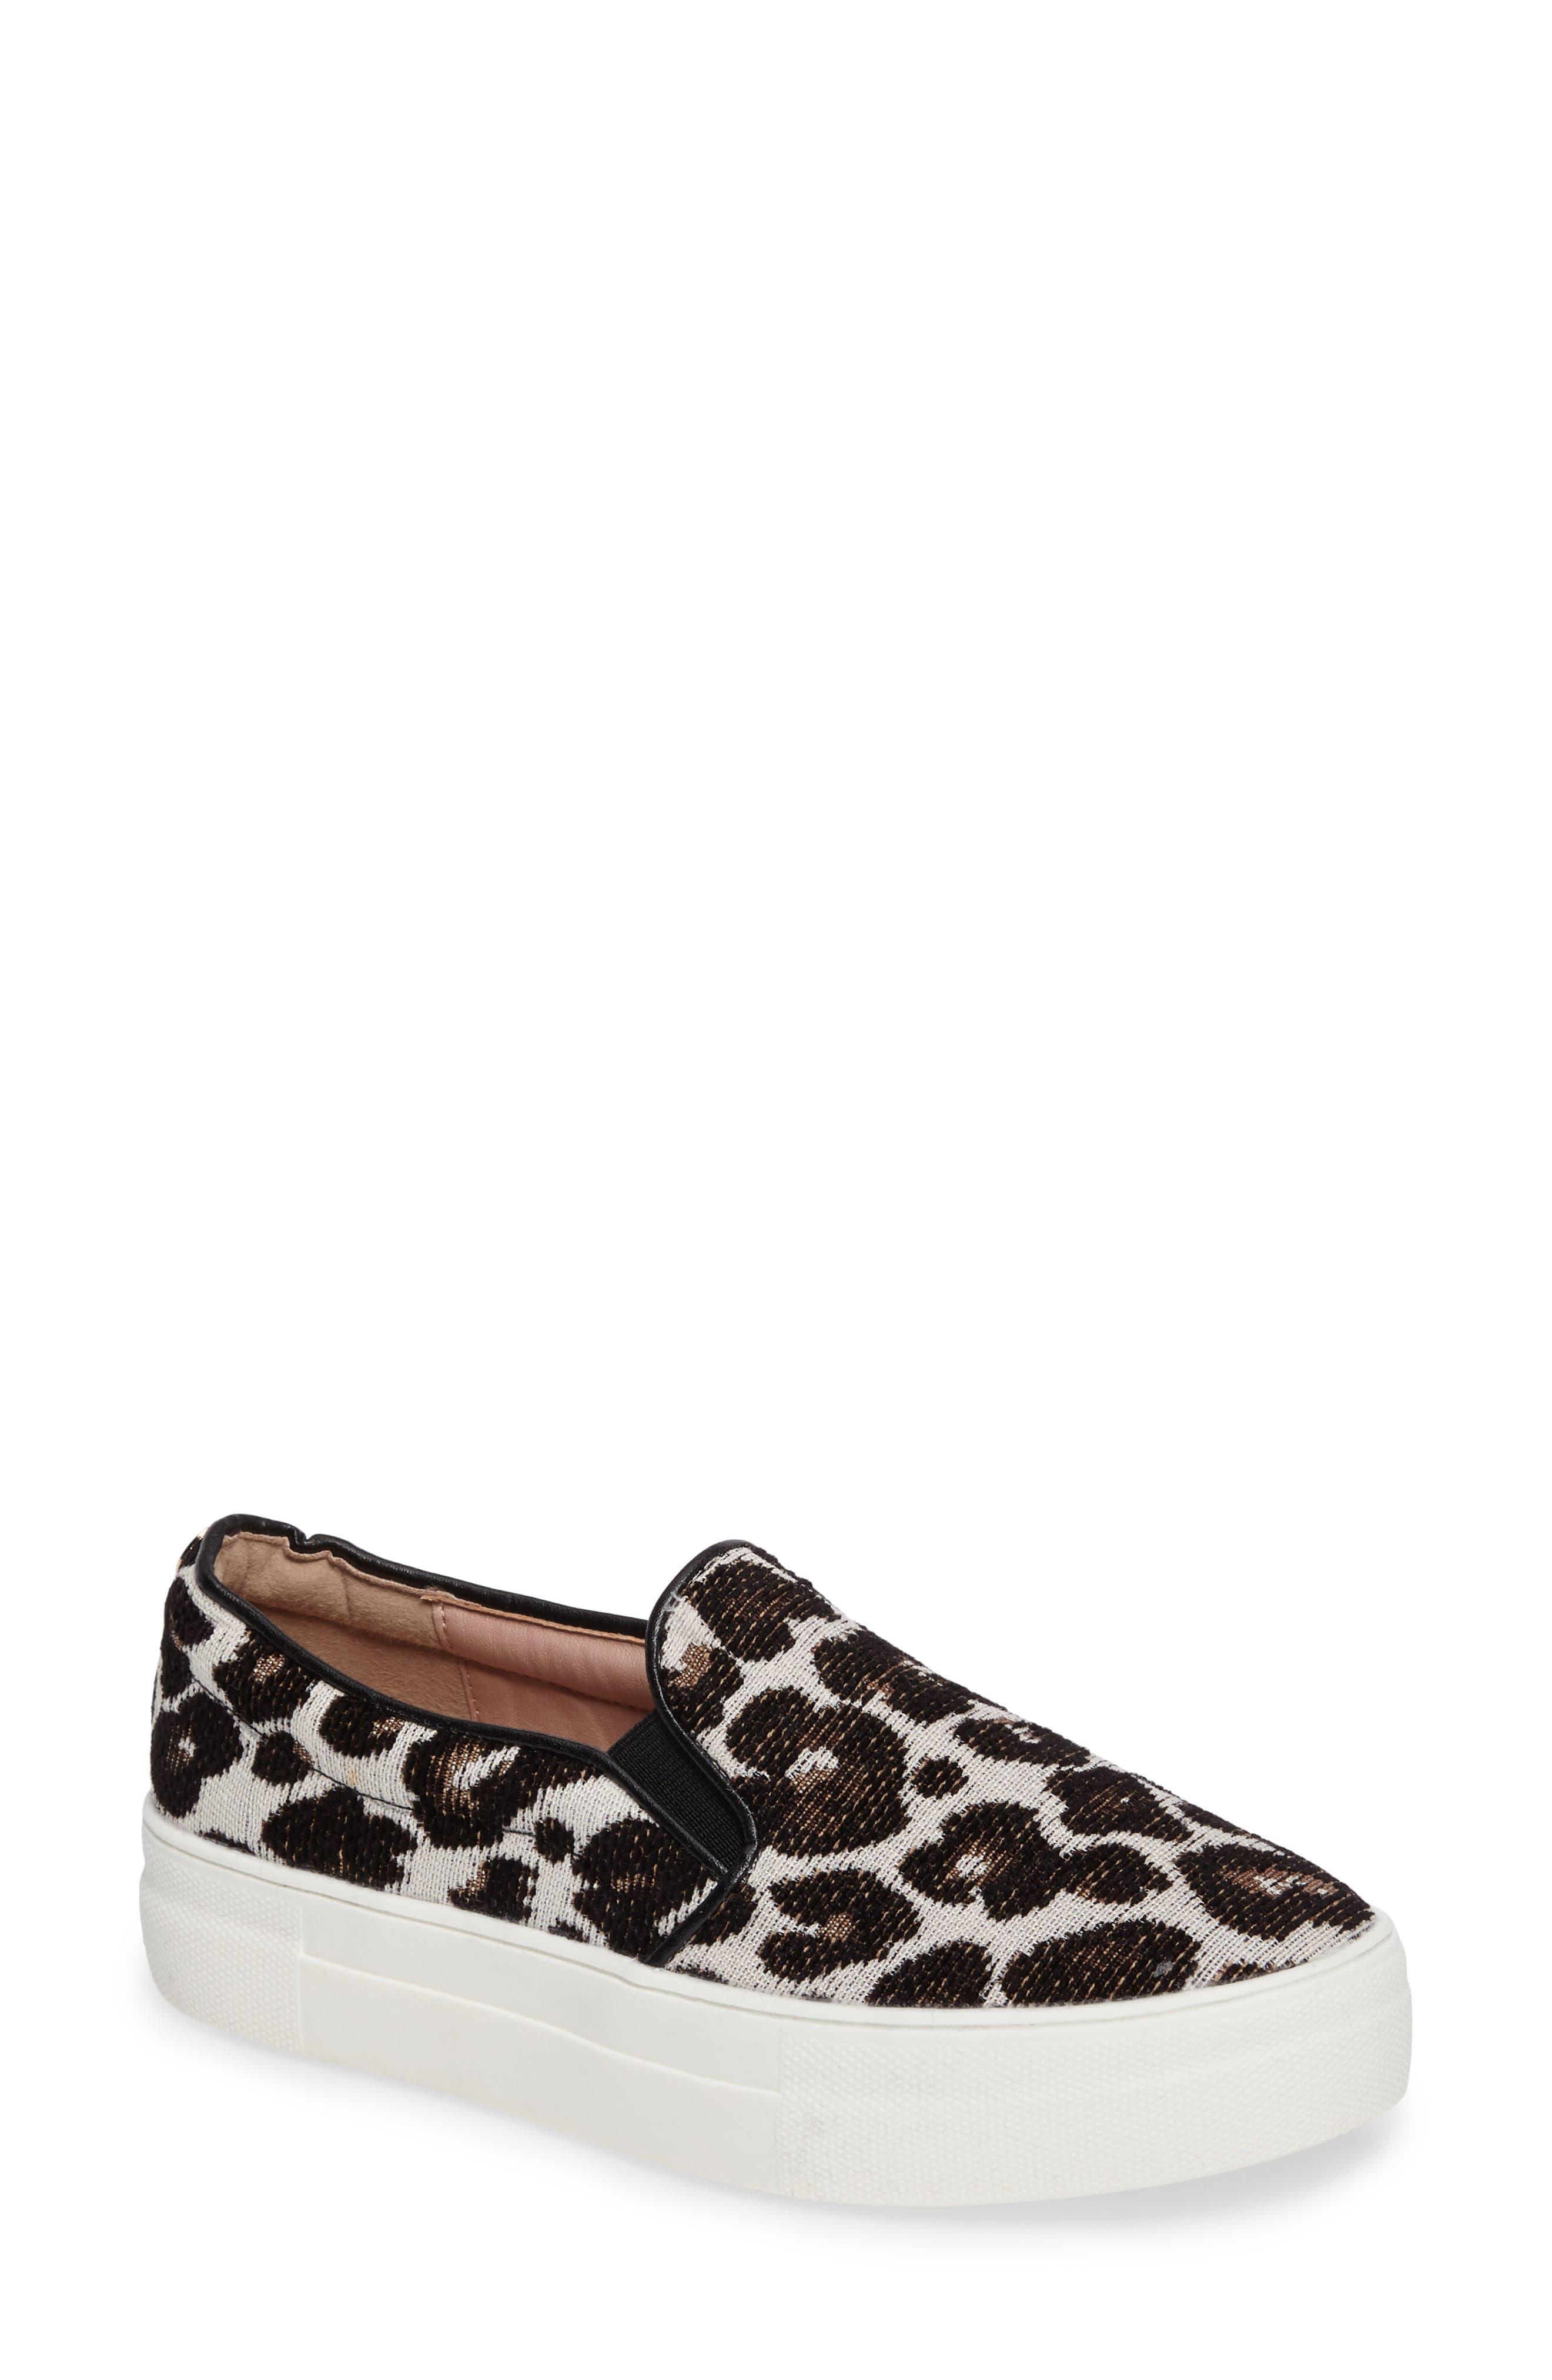 Alternate Image 1 Selected - Topshop Tucker Leopard Print Slip-On Sneaker (Women)